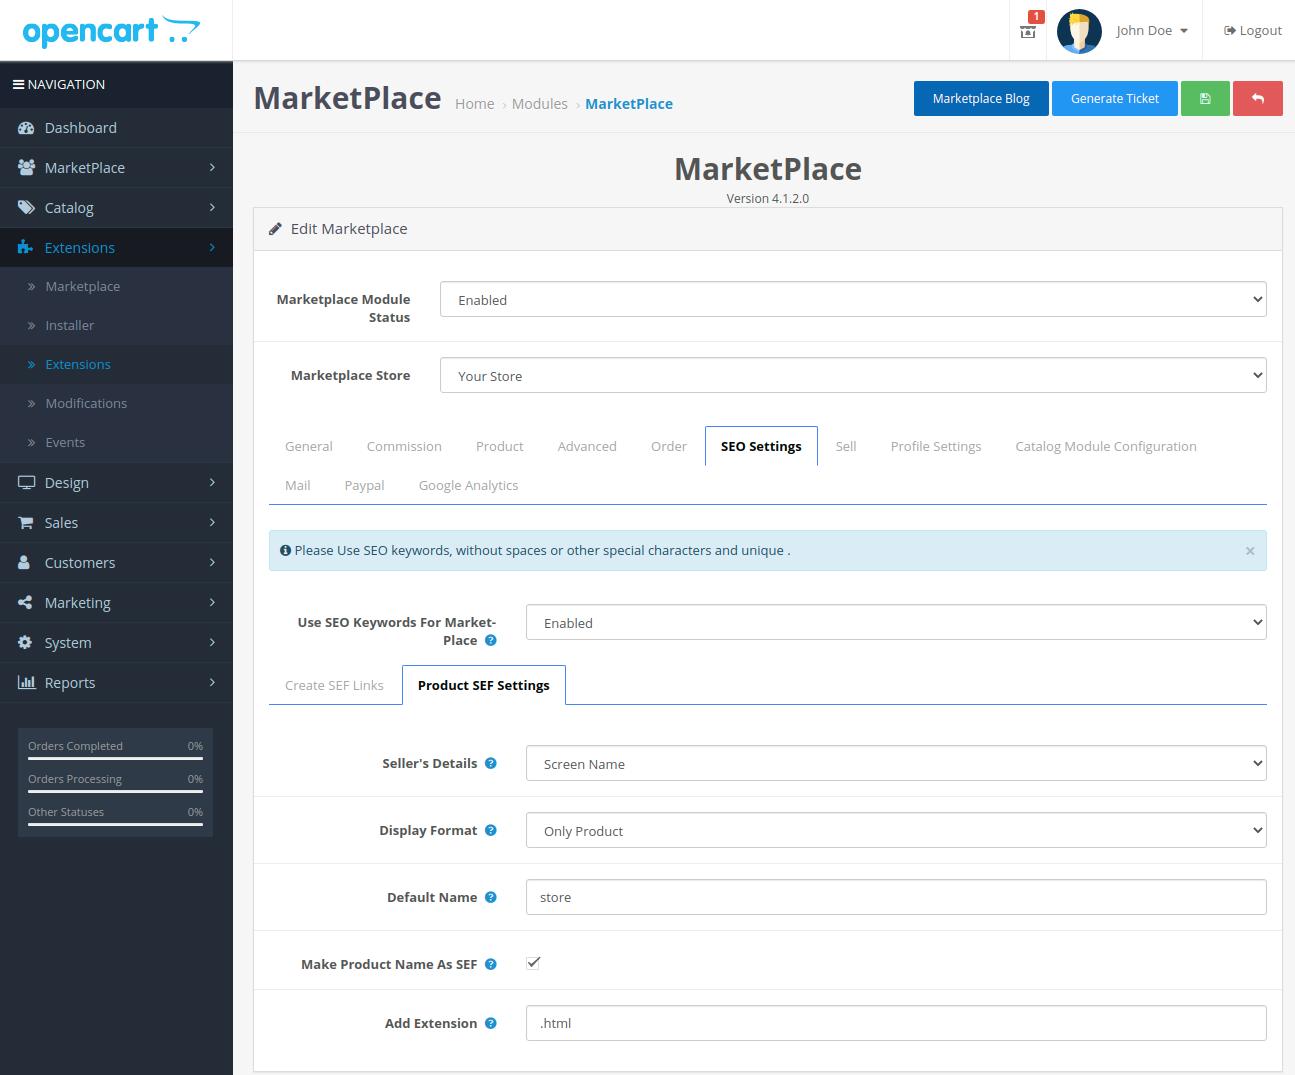 webkul-opencart-multi-vendor-marketplace-seo-settings-product-sef-tab